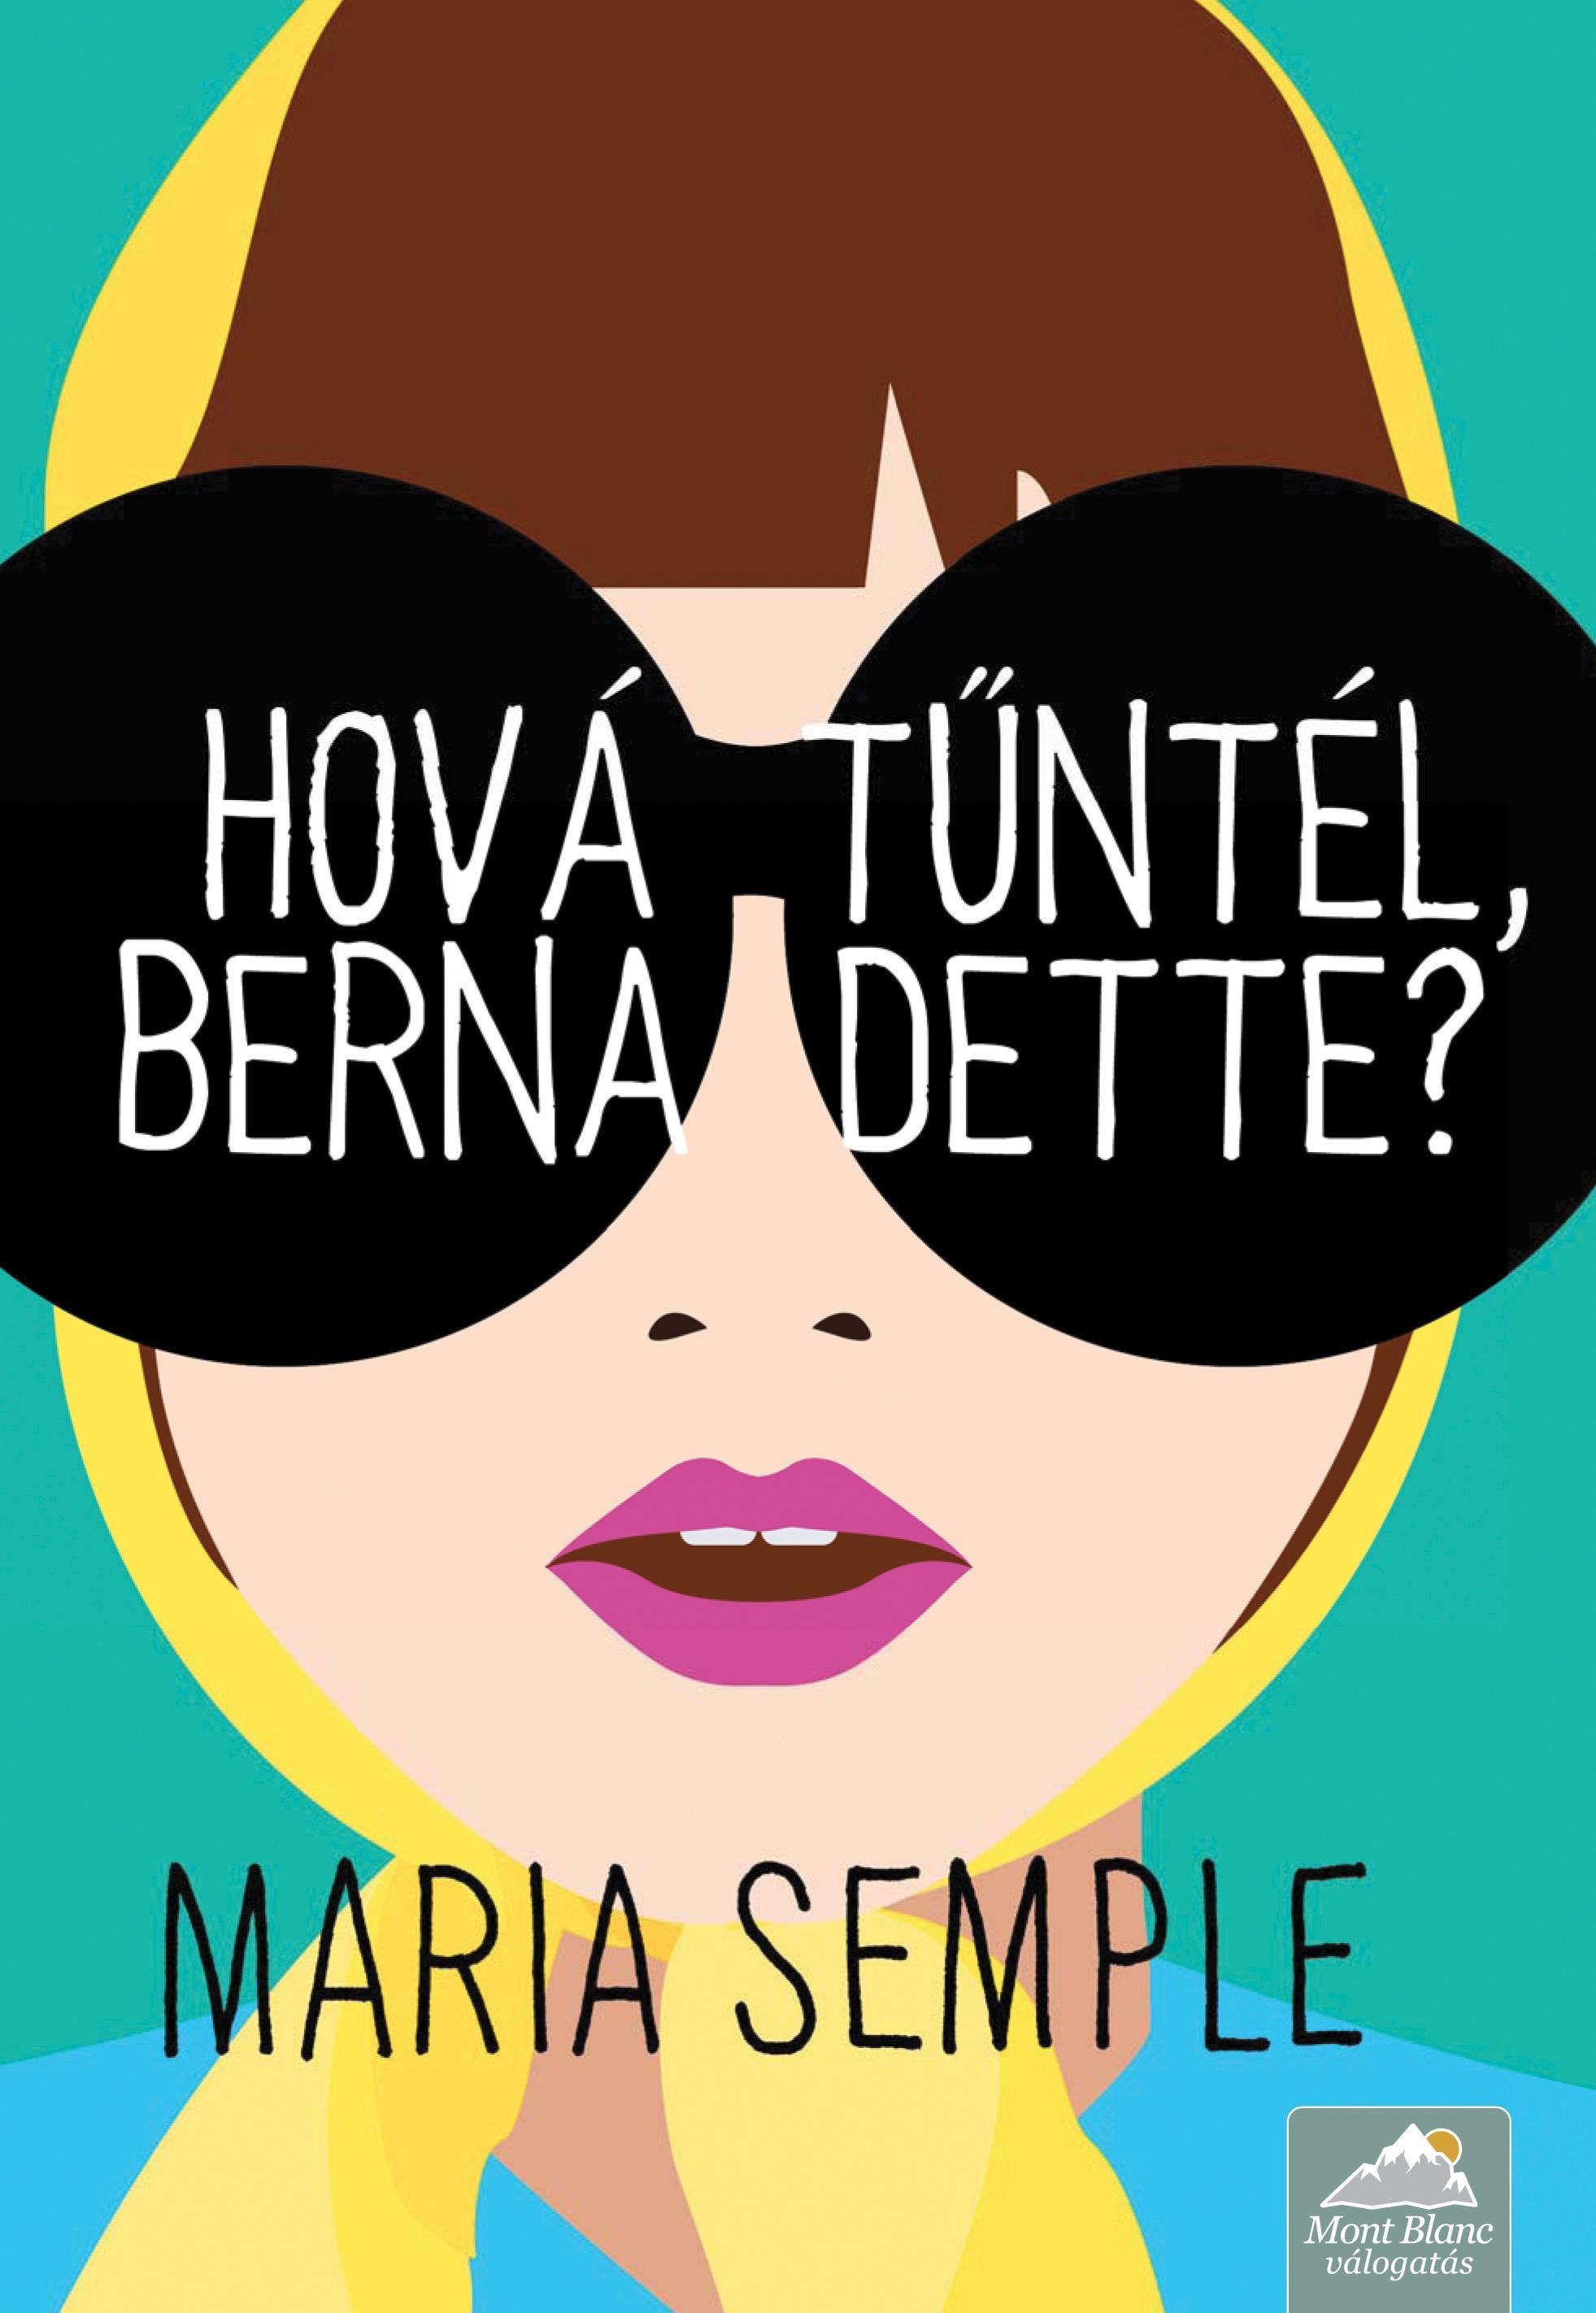 HOVÁ TŰNTÉL, BERNADETTE? - FŰZÖTT